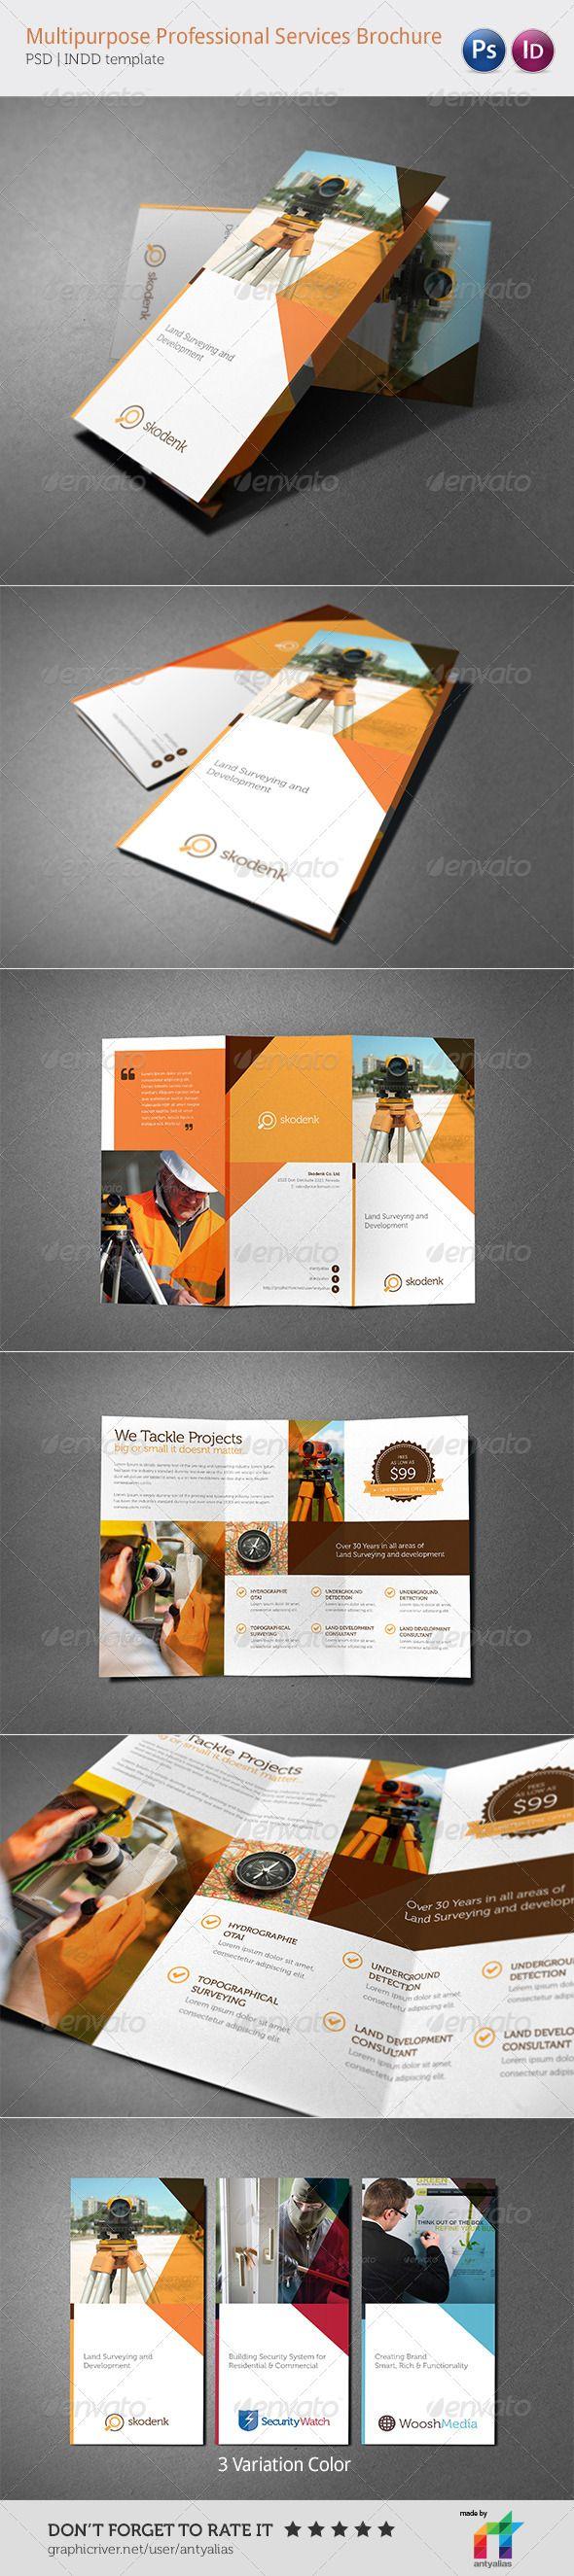 Multipurpose Professional Services Brochure - Corporate Brochures